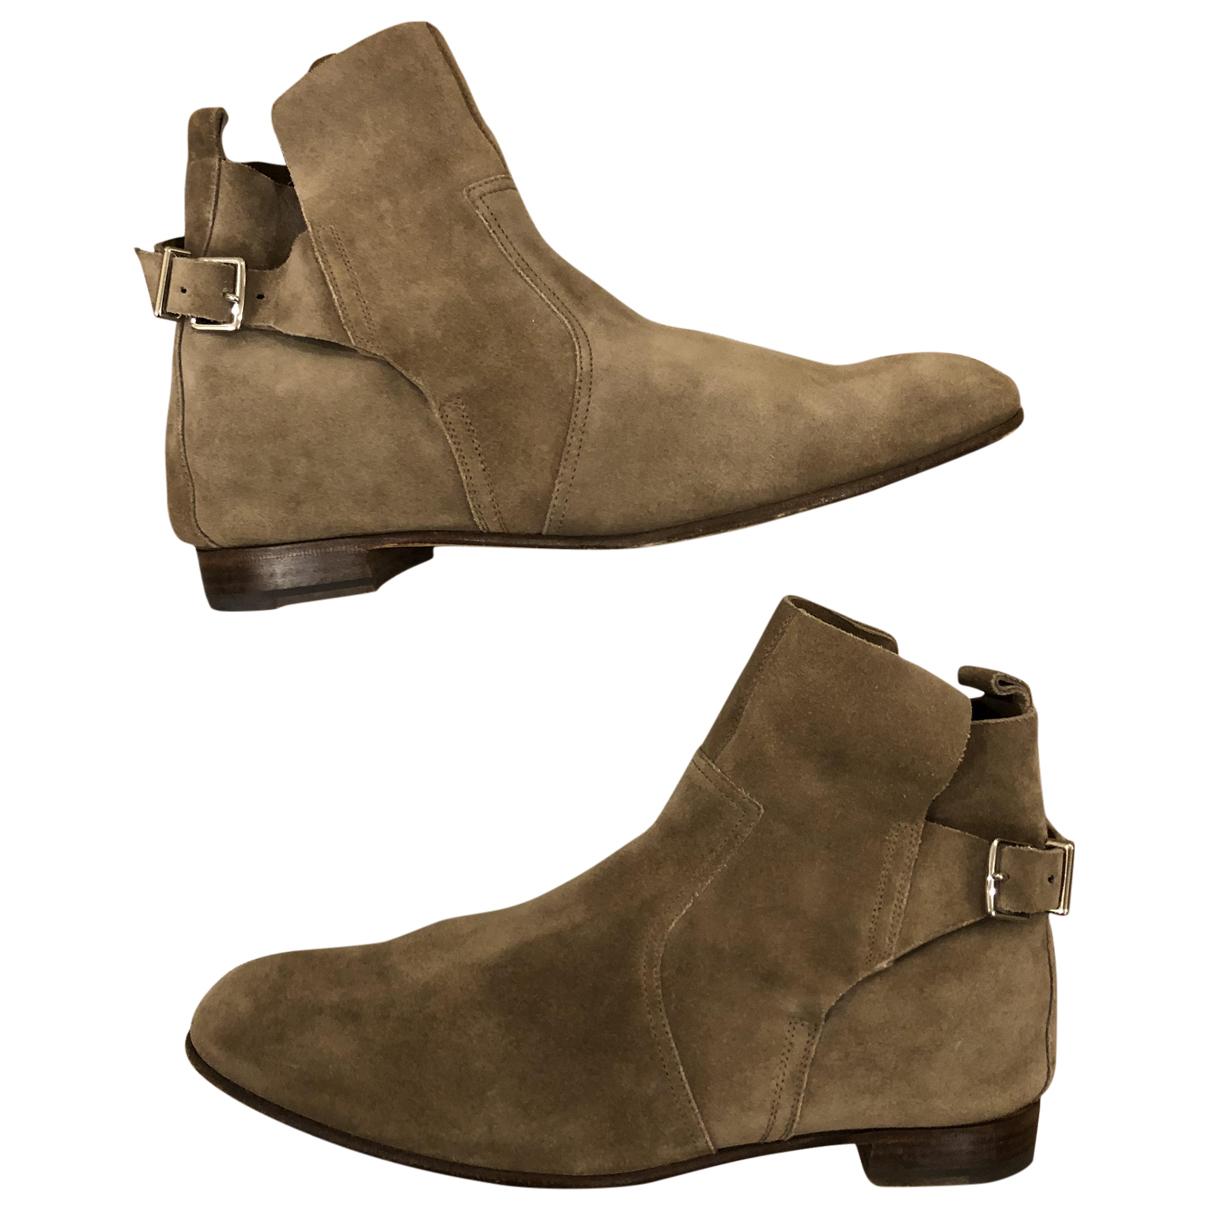 Hermès Néo Beige Suede Ankle boots for Women 38 EU